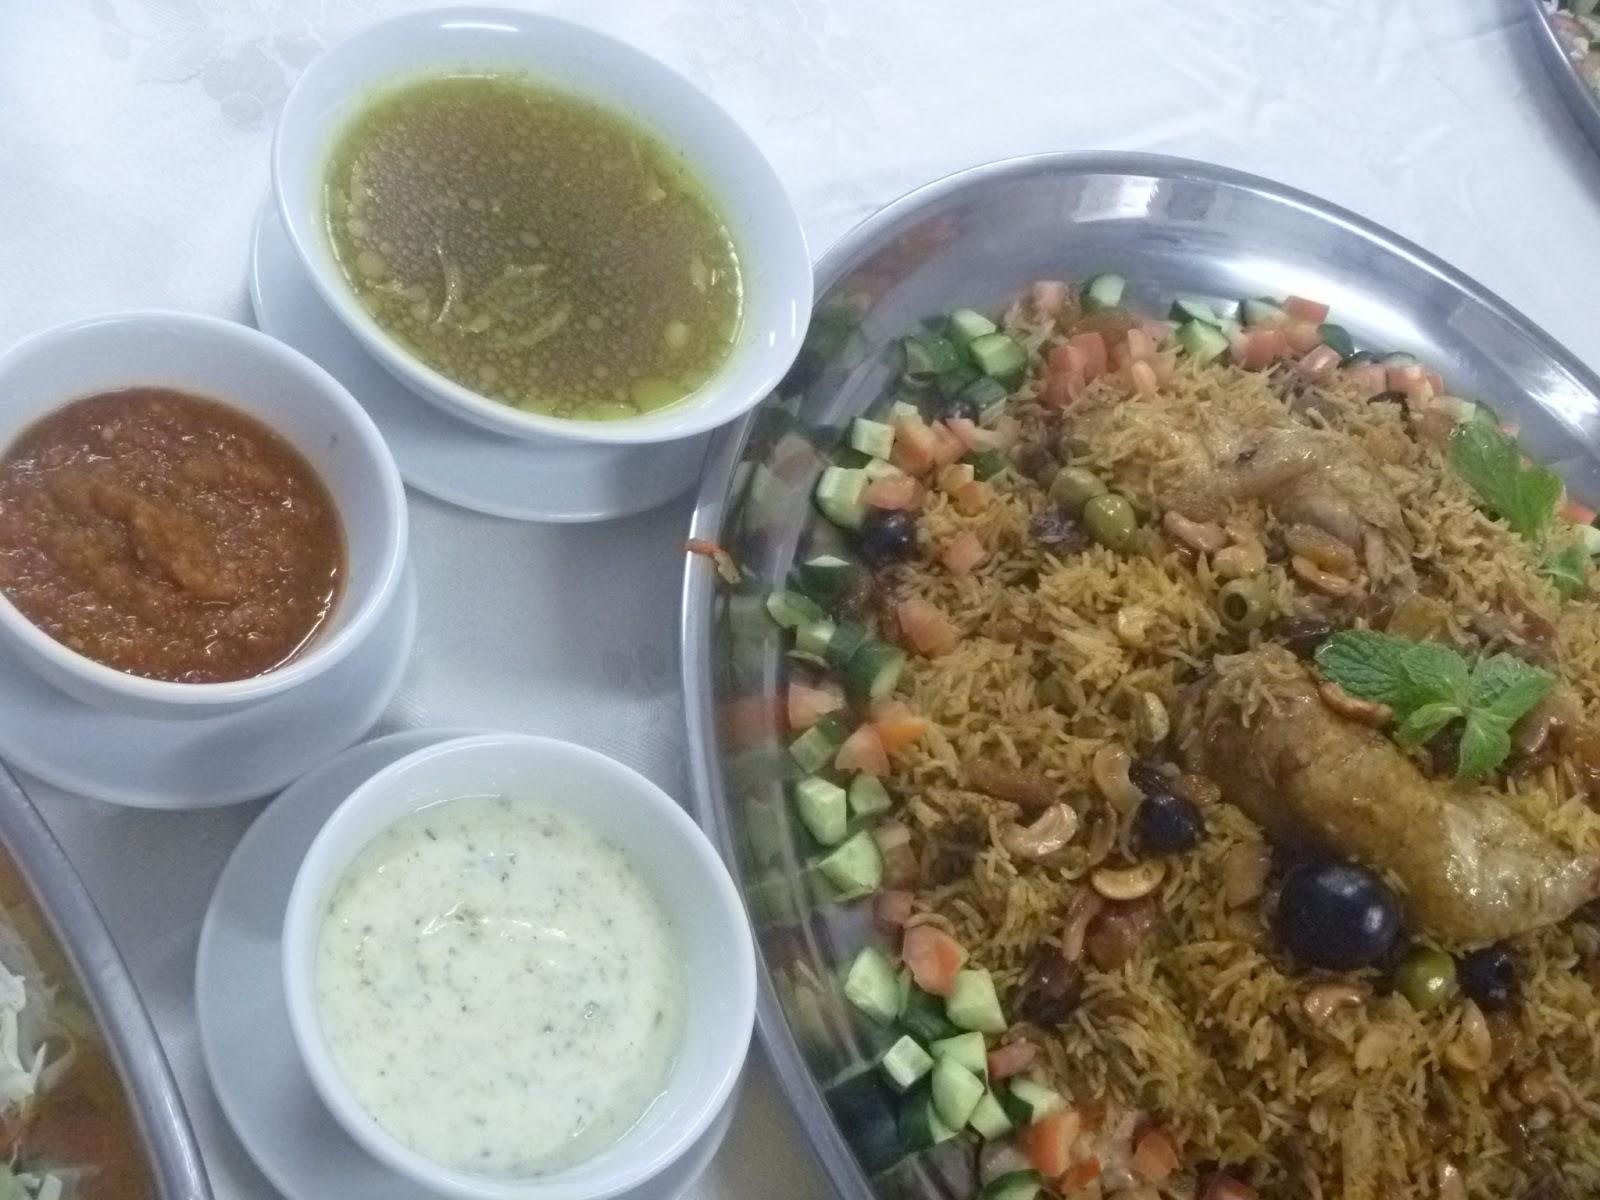 Resepi Nasi Arab Original http://chefasma.blogspot.com/2013/02/jomjadi